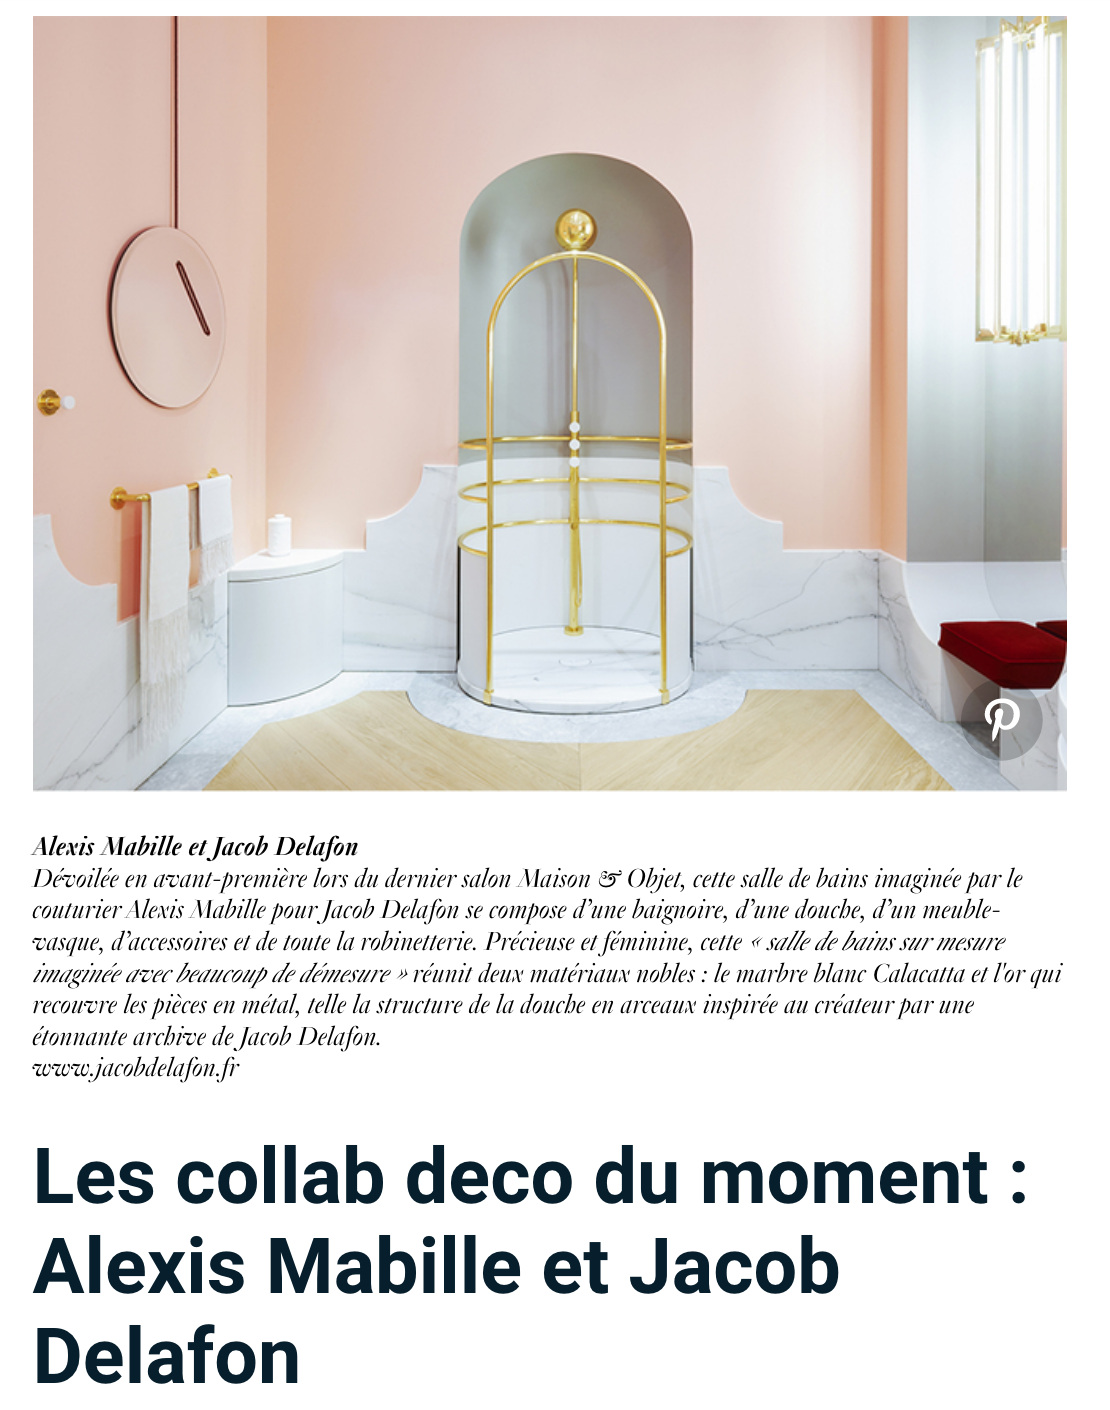 admagazine.fr_oct17.png